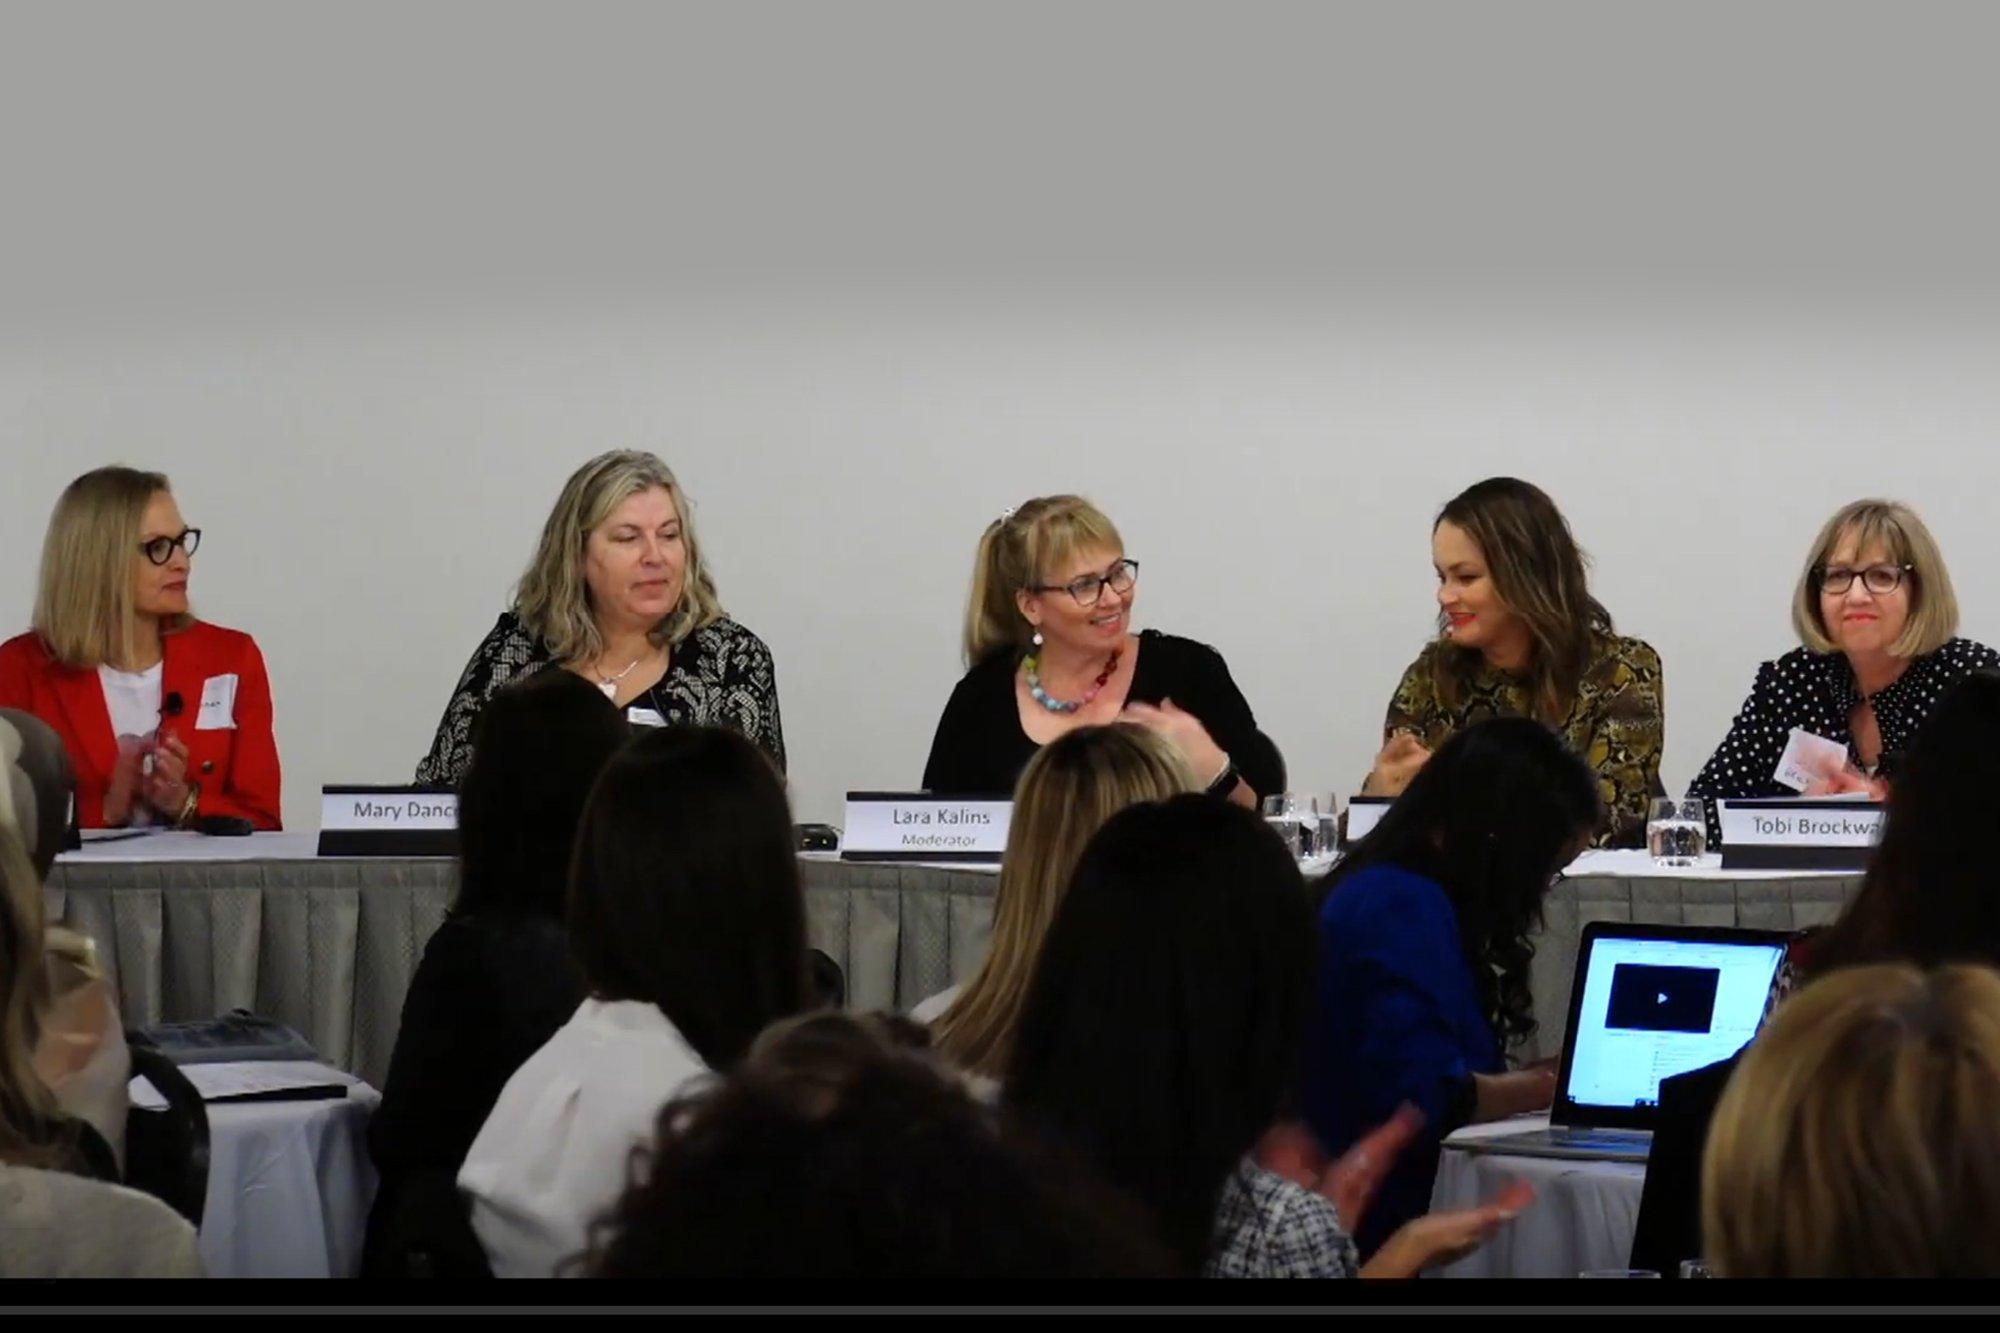 DDA Canada panel discusses running a successful design firm